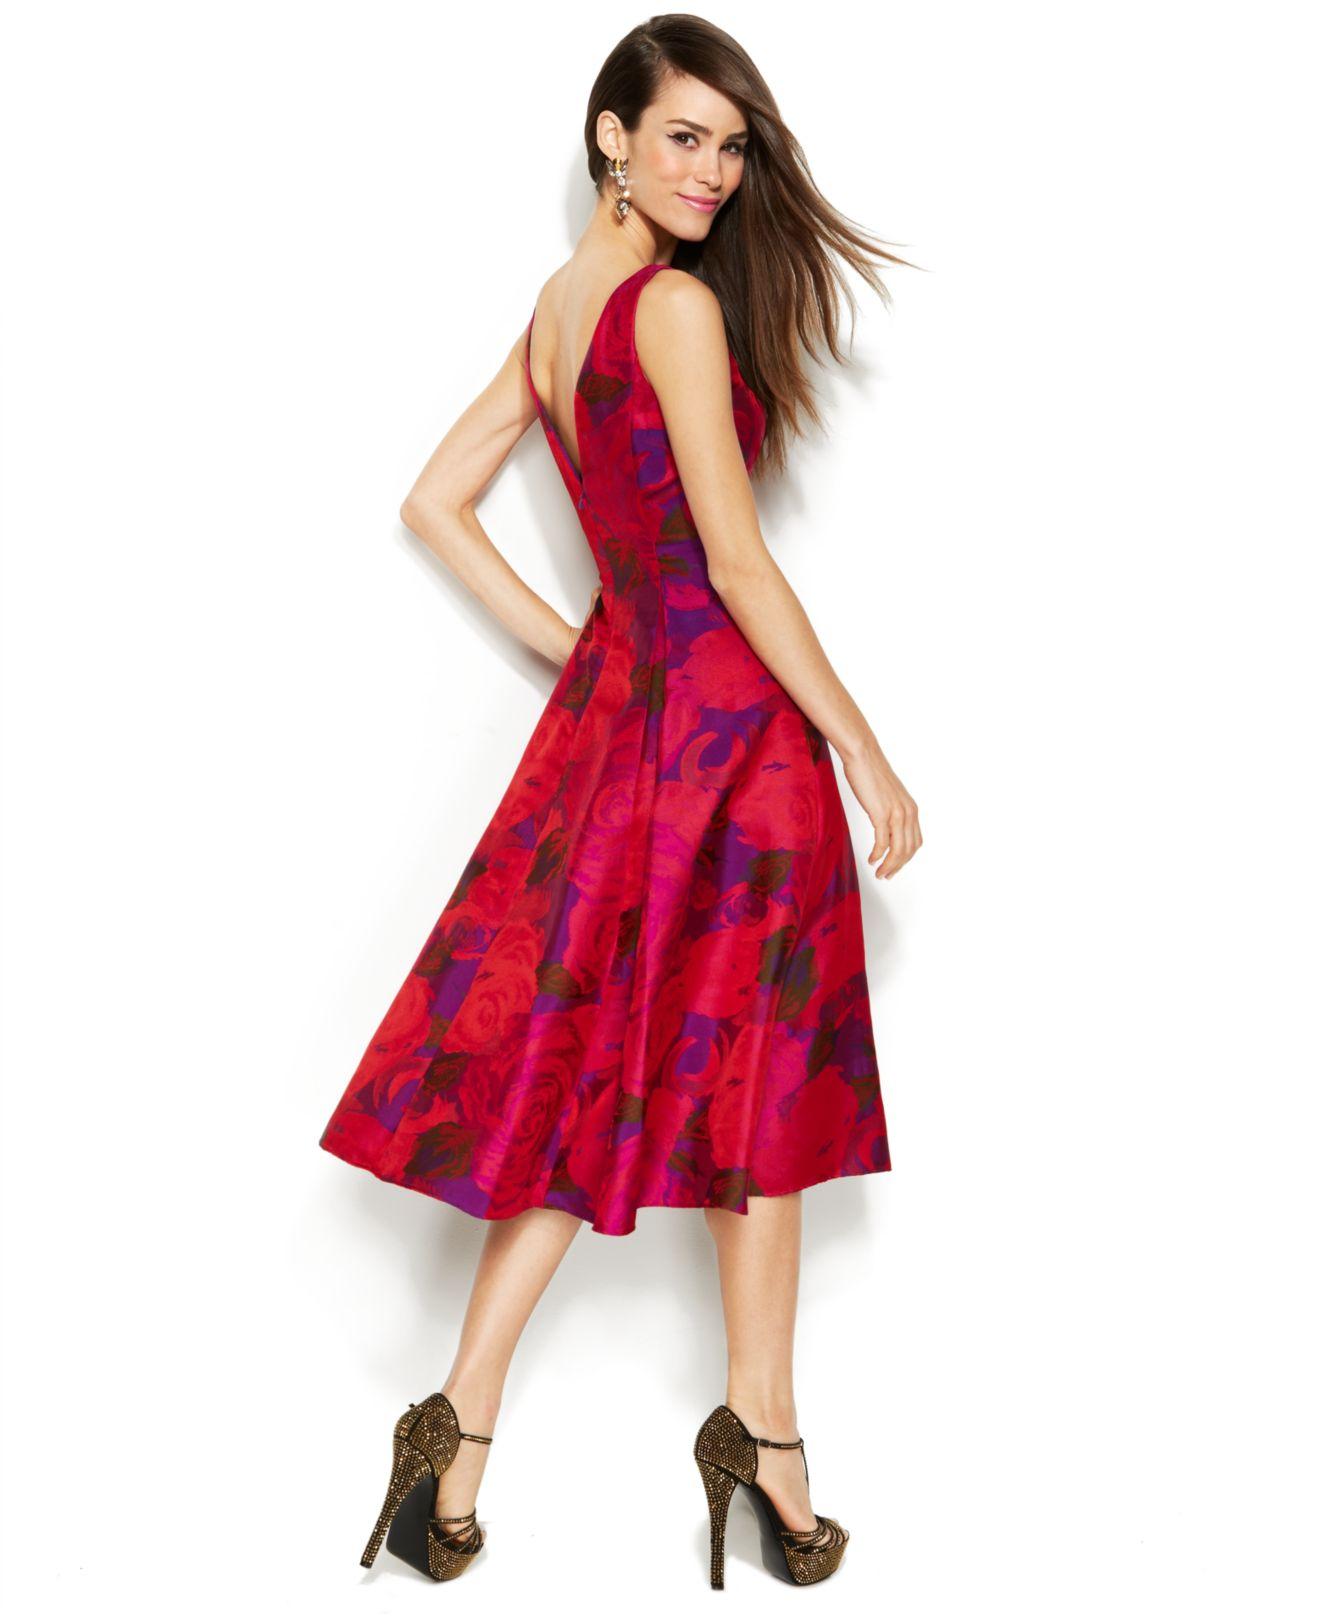 e1b14d726d8 Lyst - Adrianna Papell Sleeveless Rose-Print Midi Dress in Red